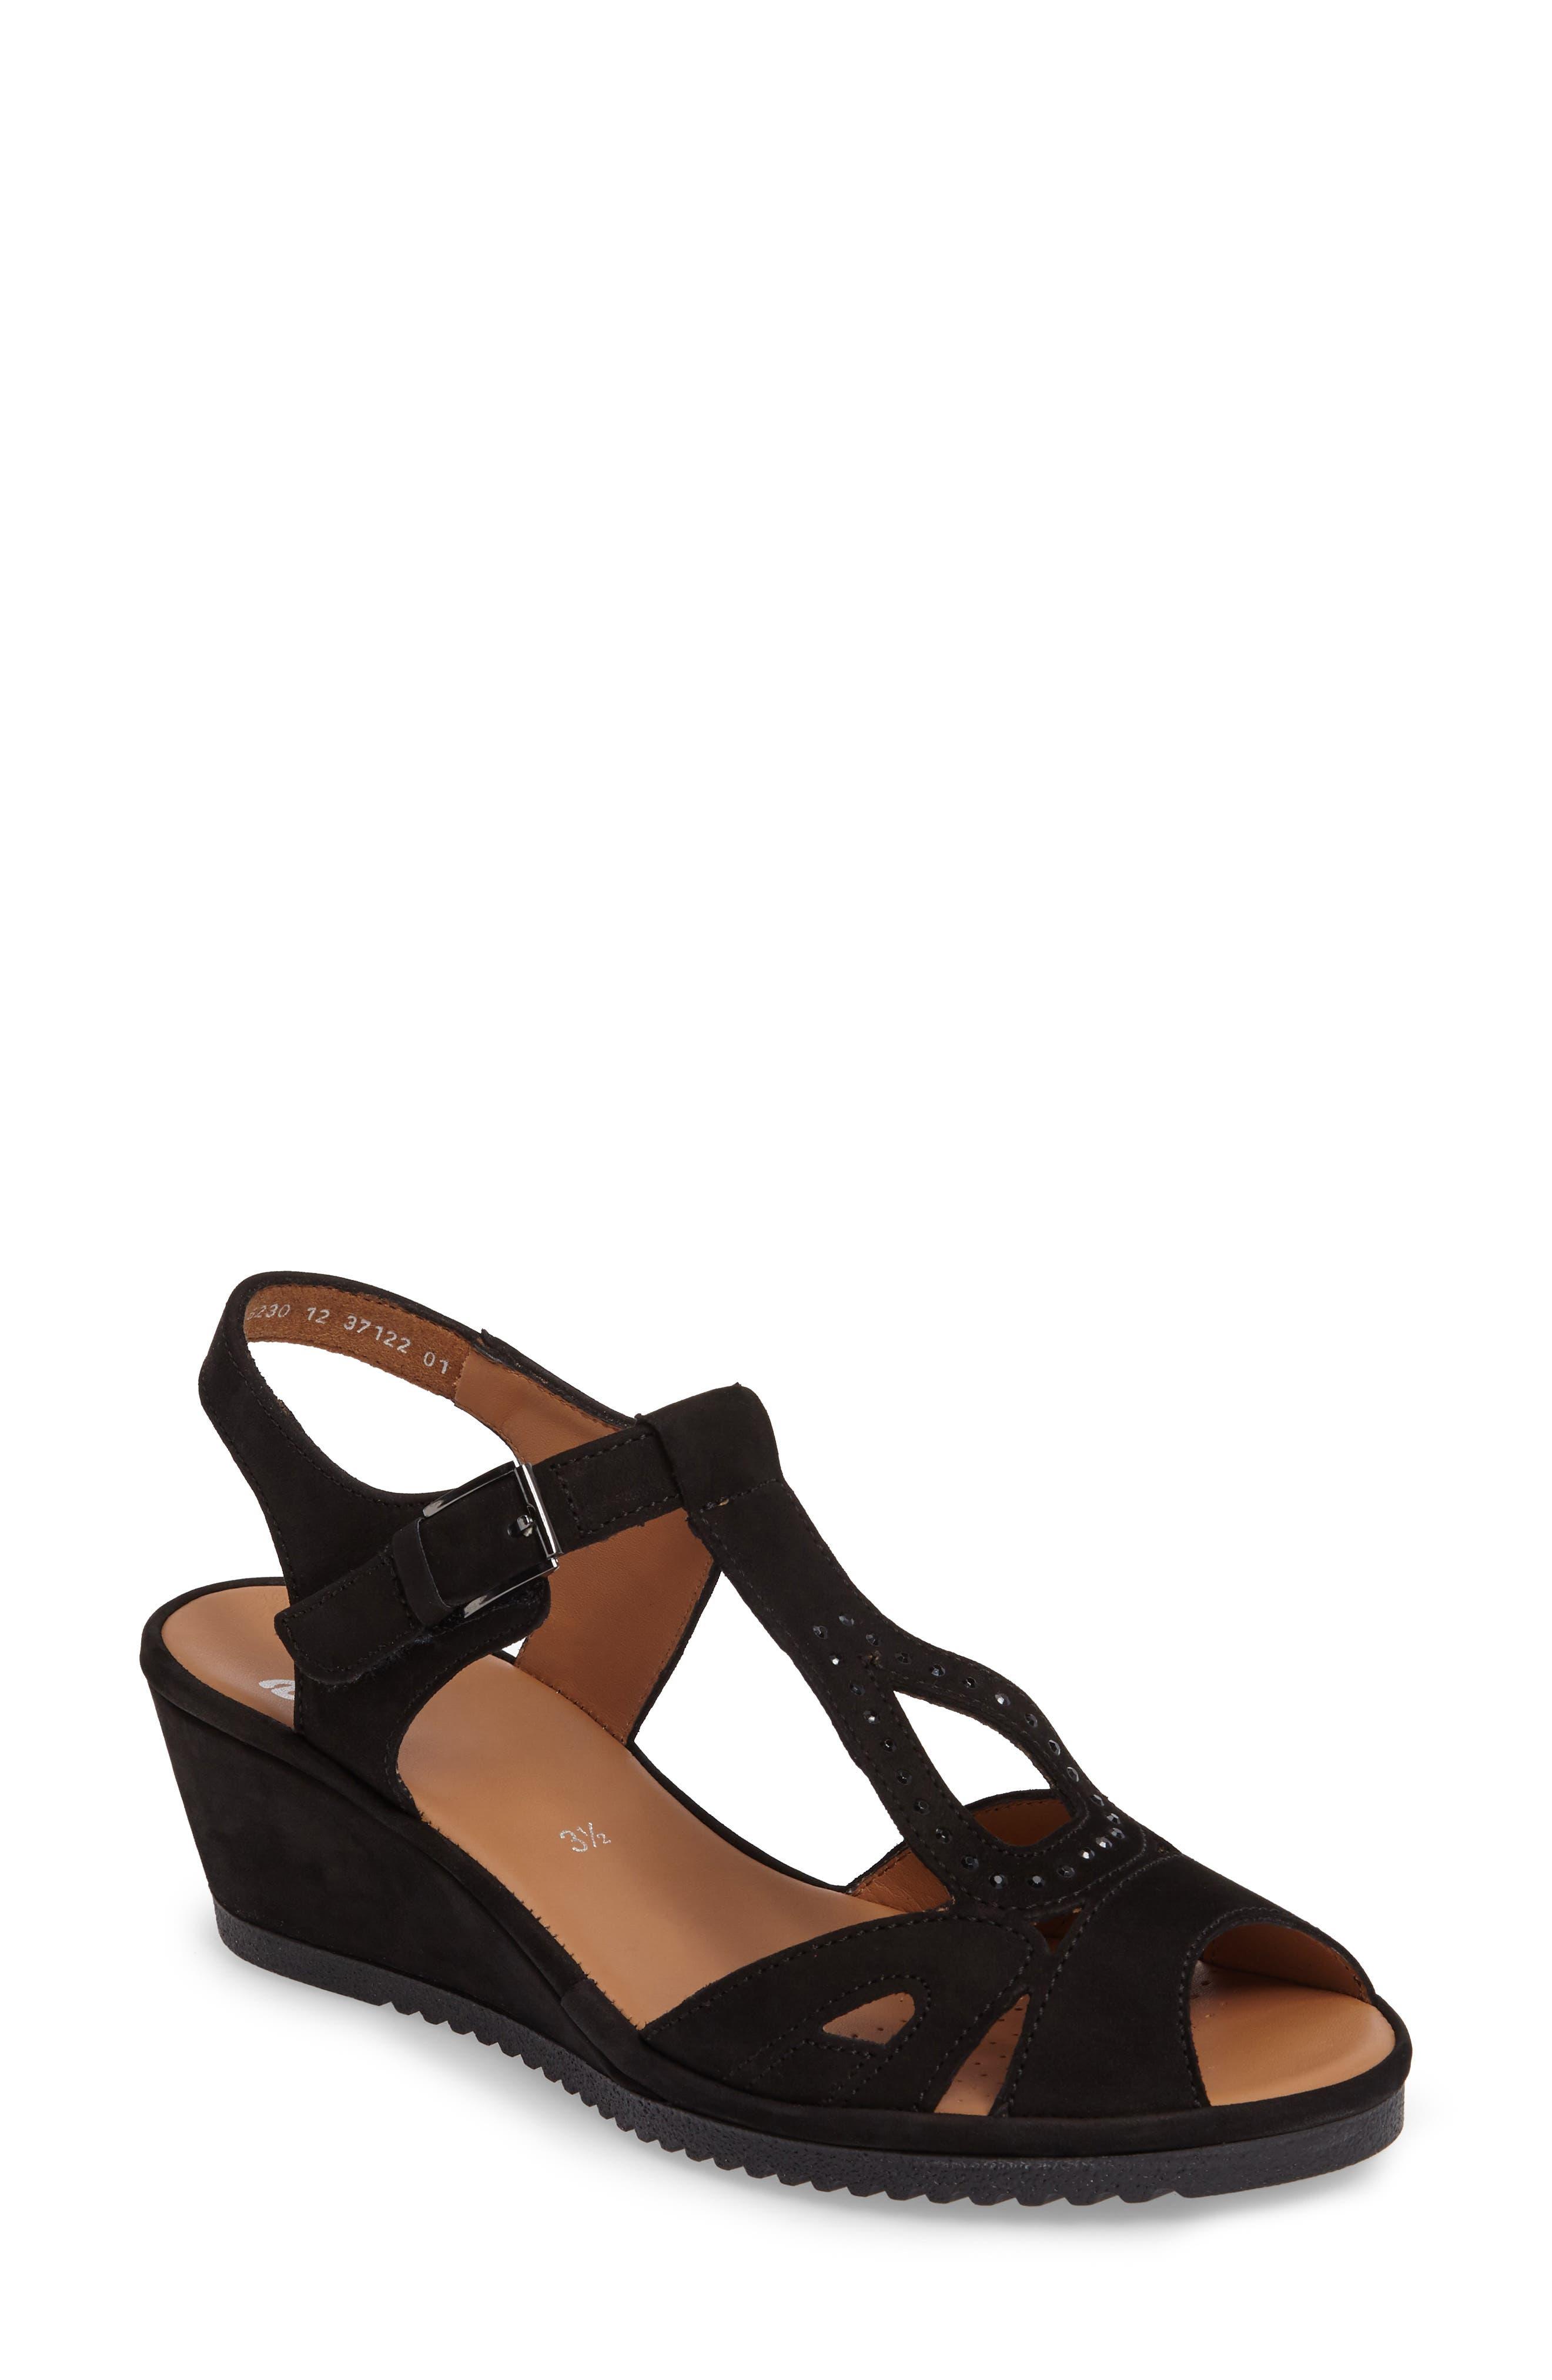 Wedge Sandal,                             Main thumbnail 1, color,                             BLACK